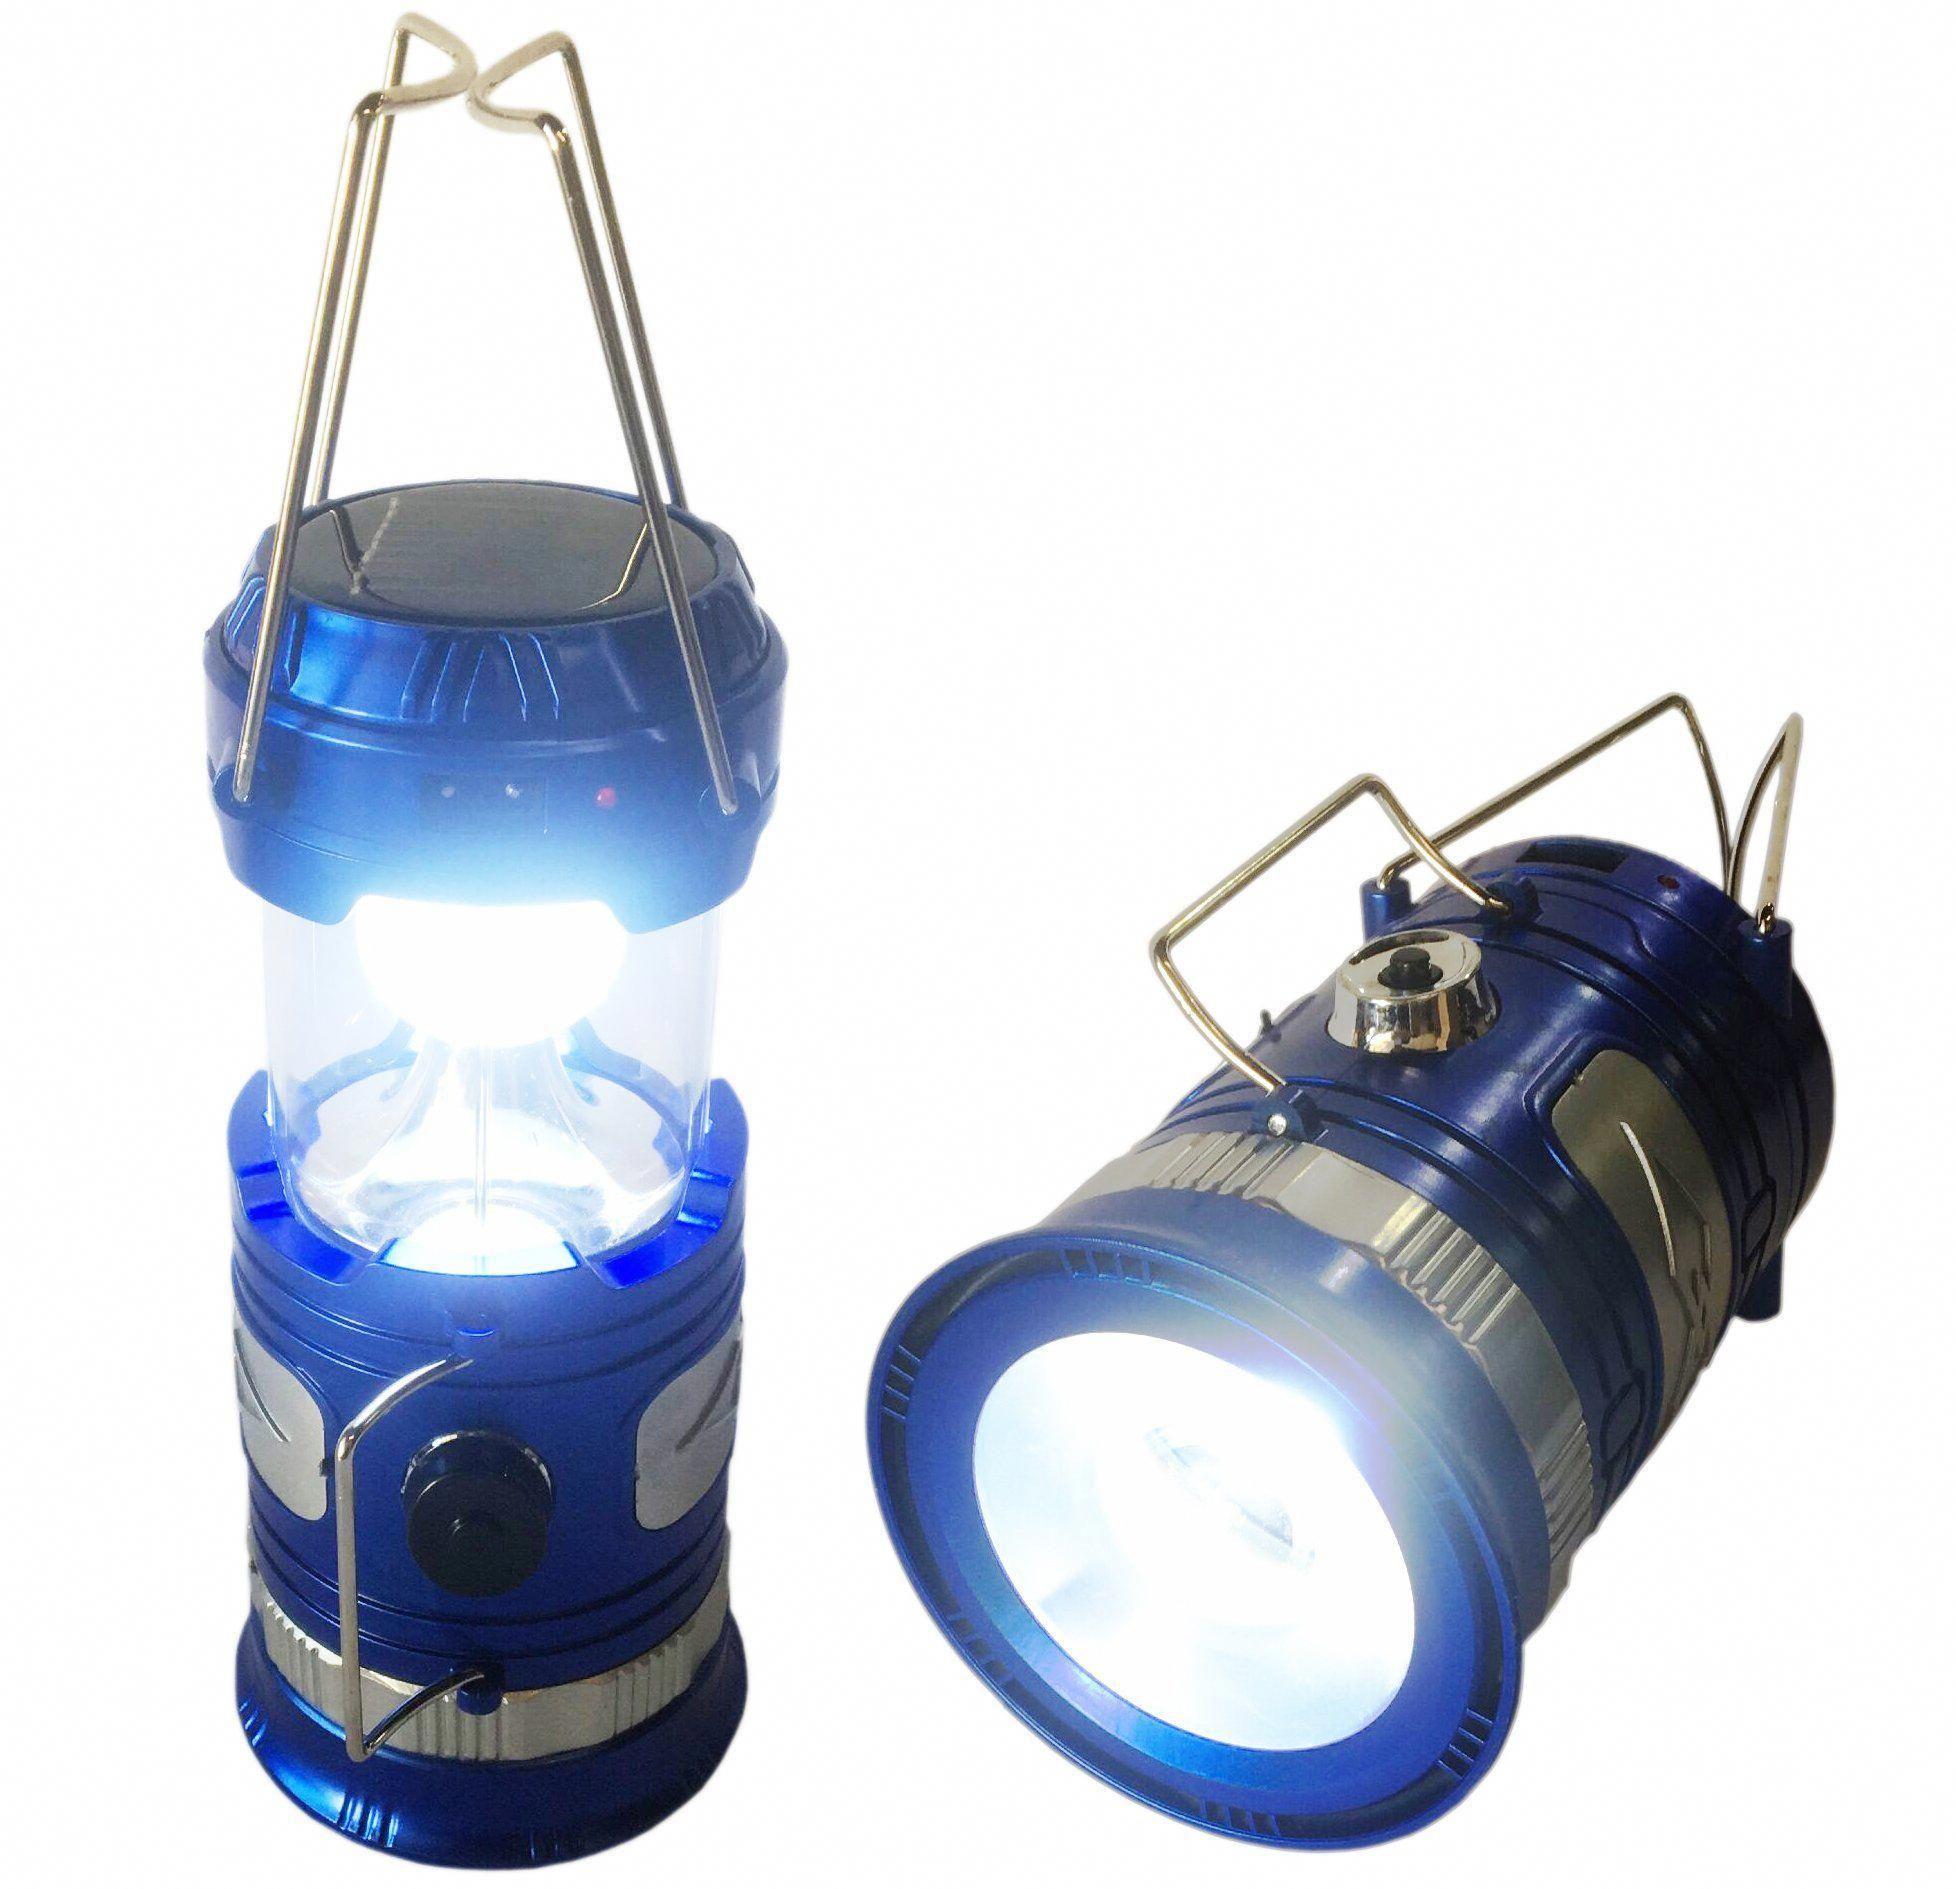 Solar Powered Camping Lantern Solar Led Camp Light Handheld Flashlight Campinglights Camping Lights Solar Led Solar Powered Lanterns